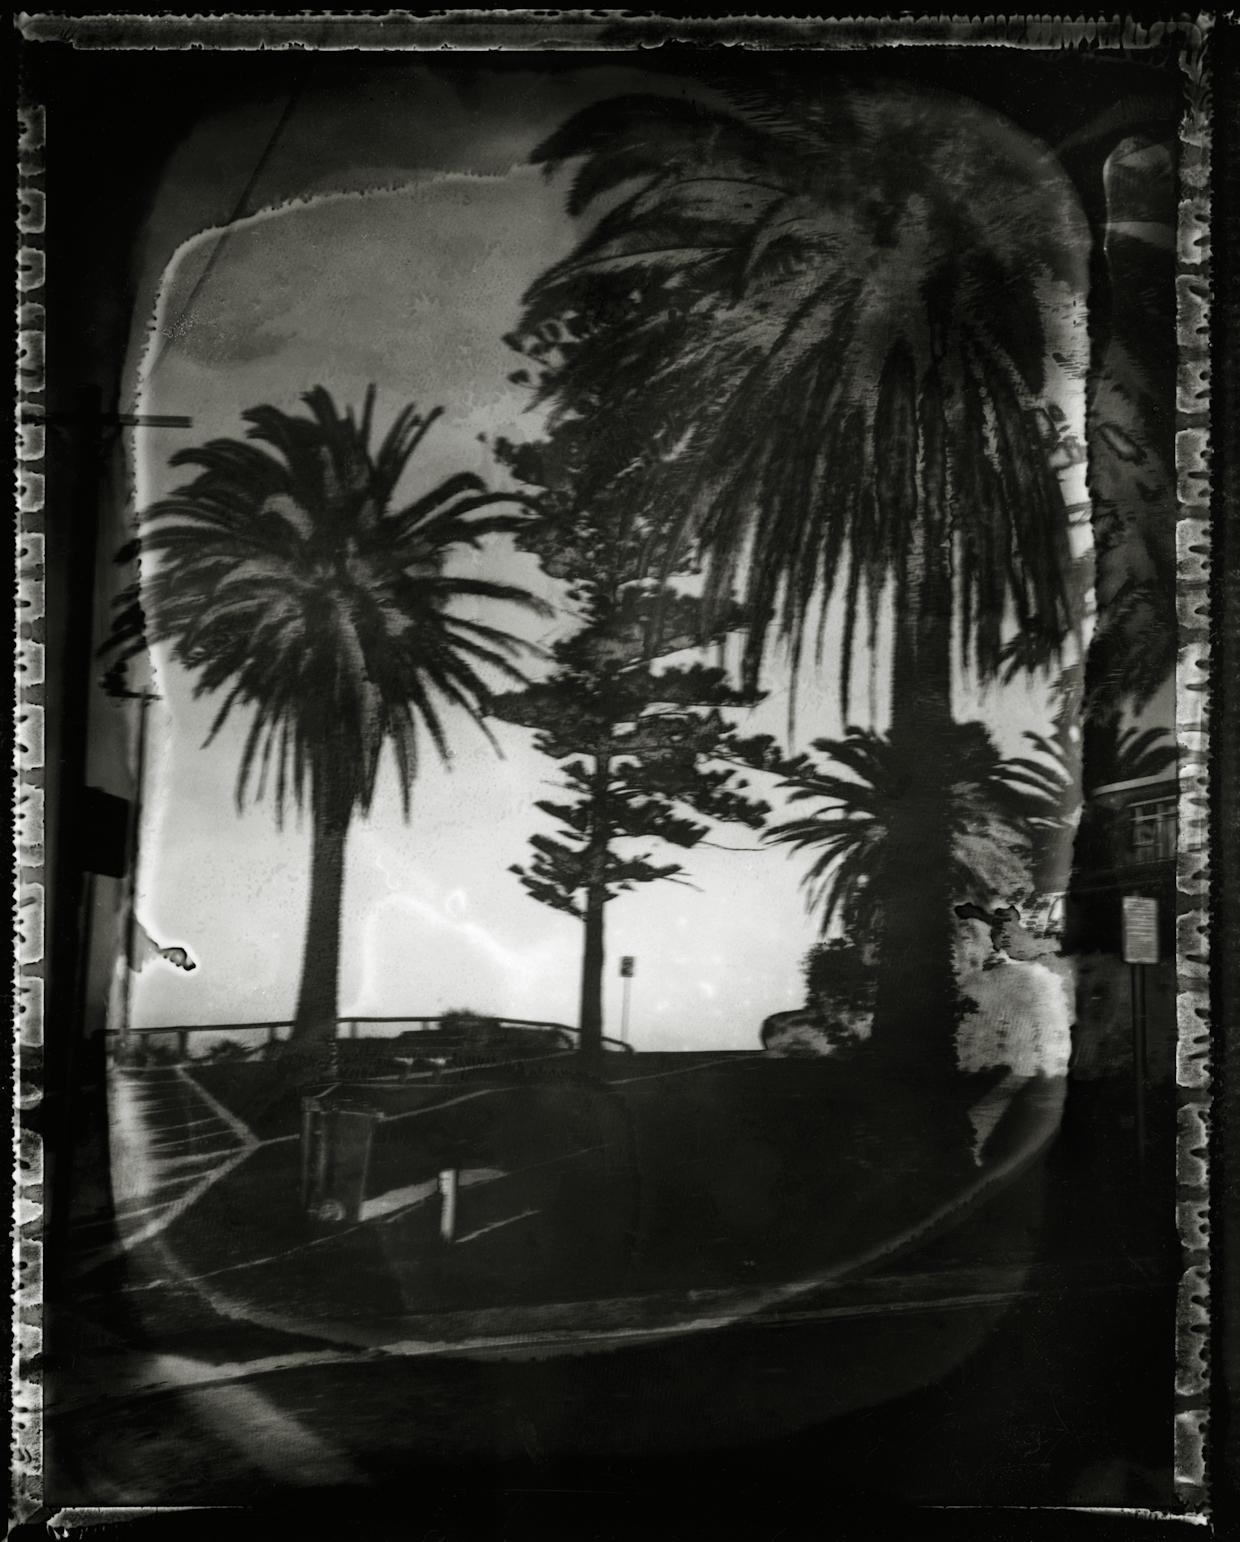 Pola-arbre 1.jpg